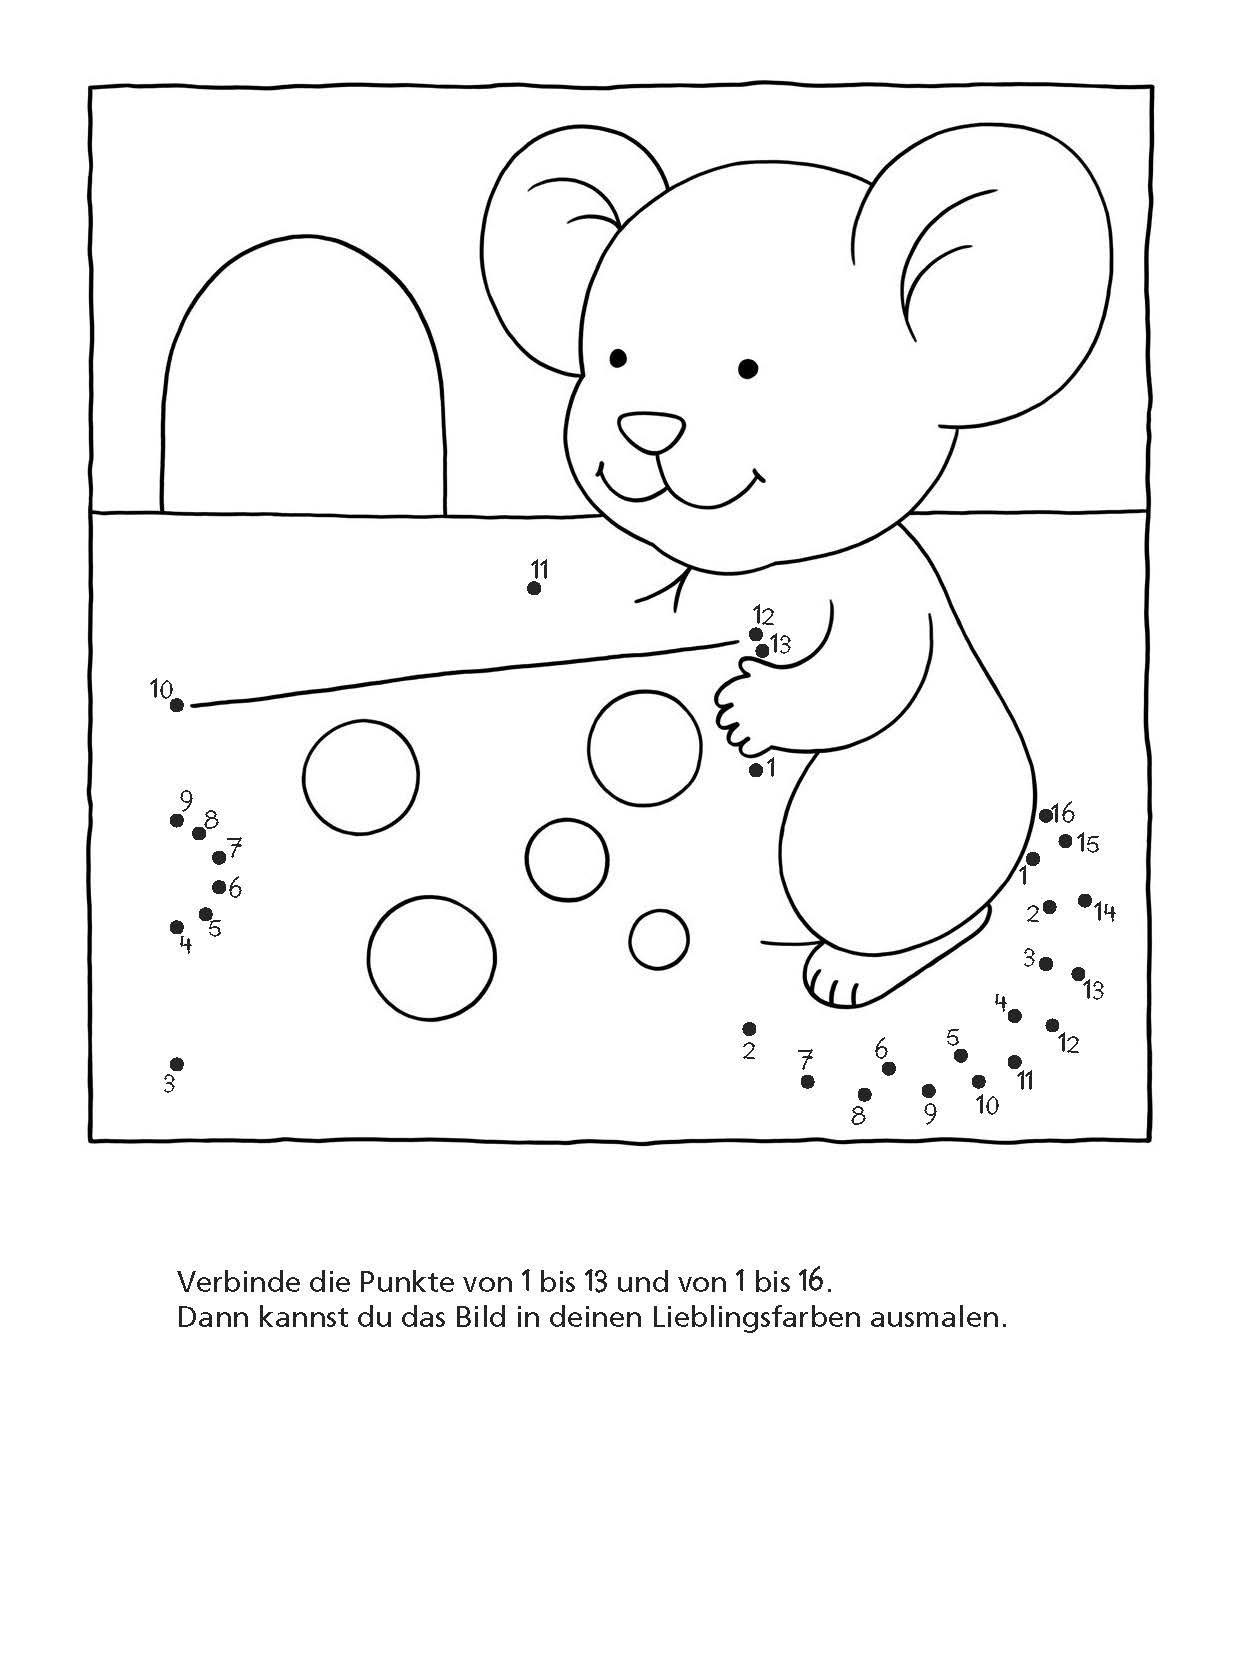 Mathe Malbuch Rechnen Bis 20 9783849909871 Amazon Com Books